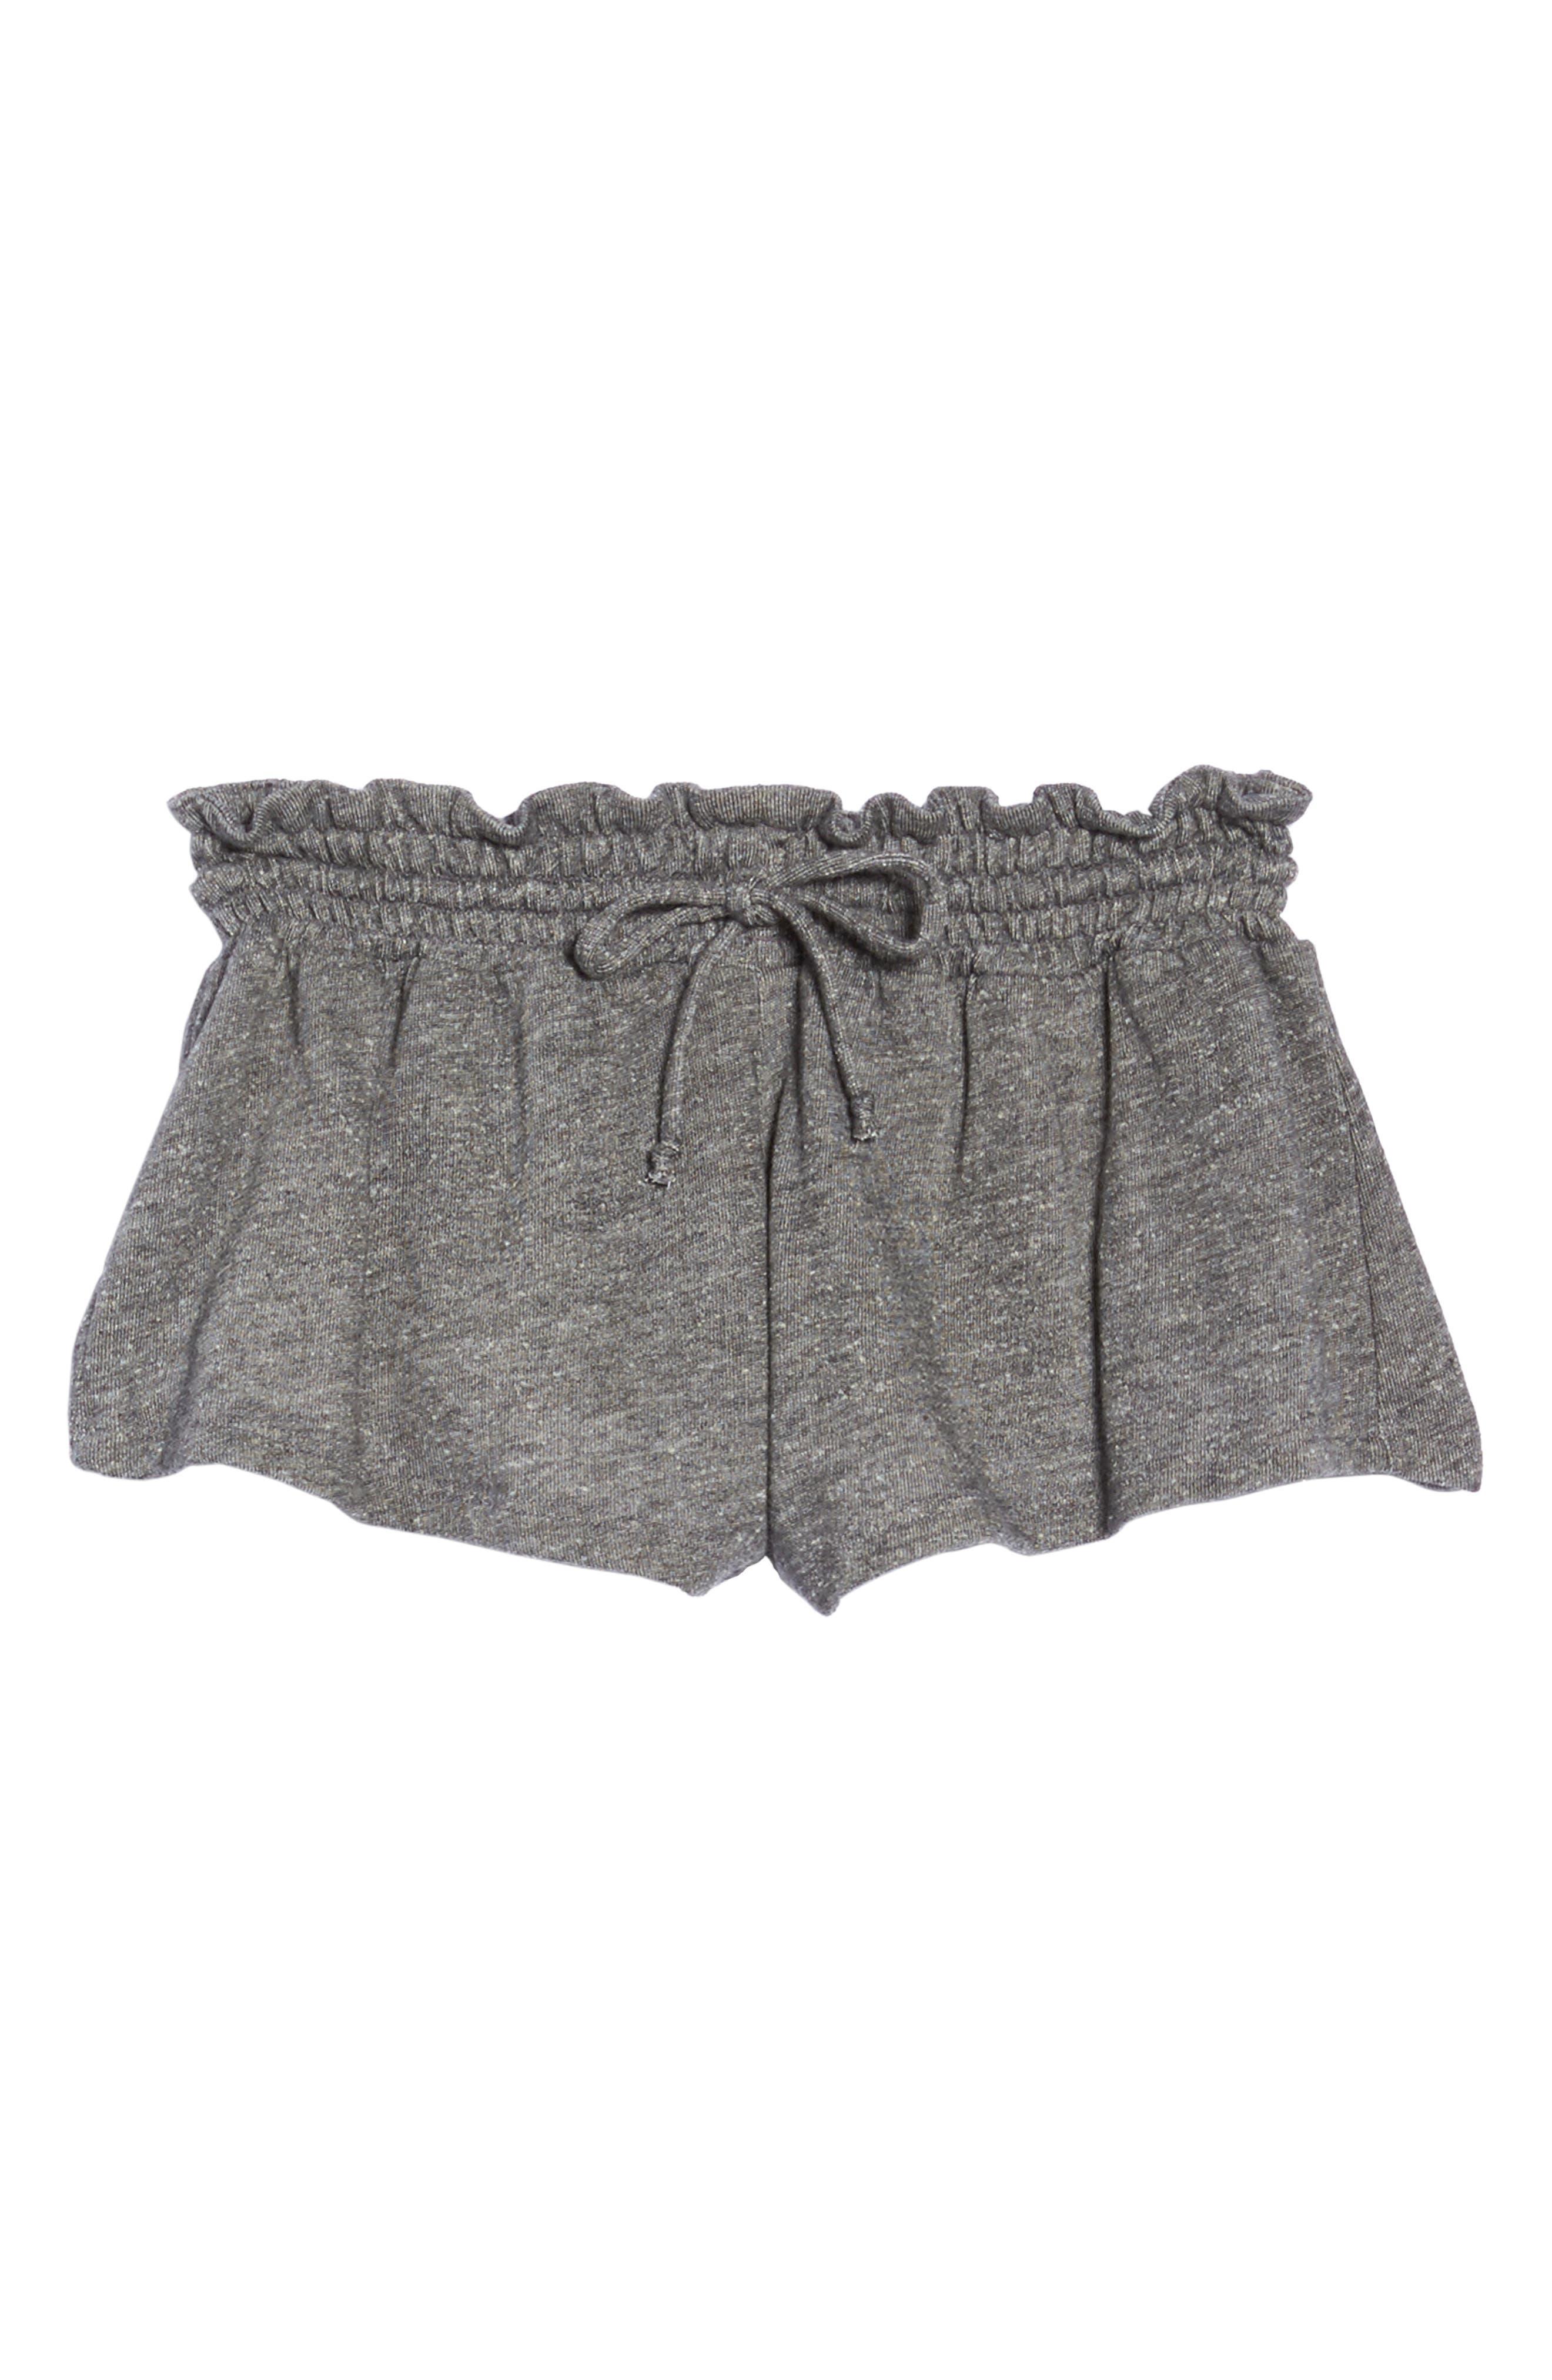 Dallas Shorts,                             Alternate thumbnail 6, color,                             001